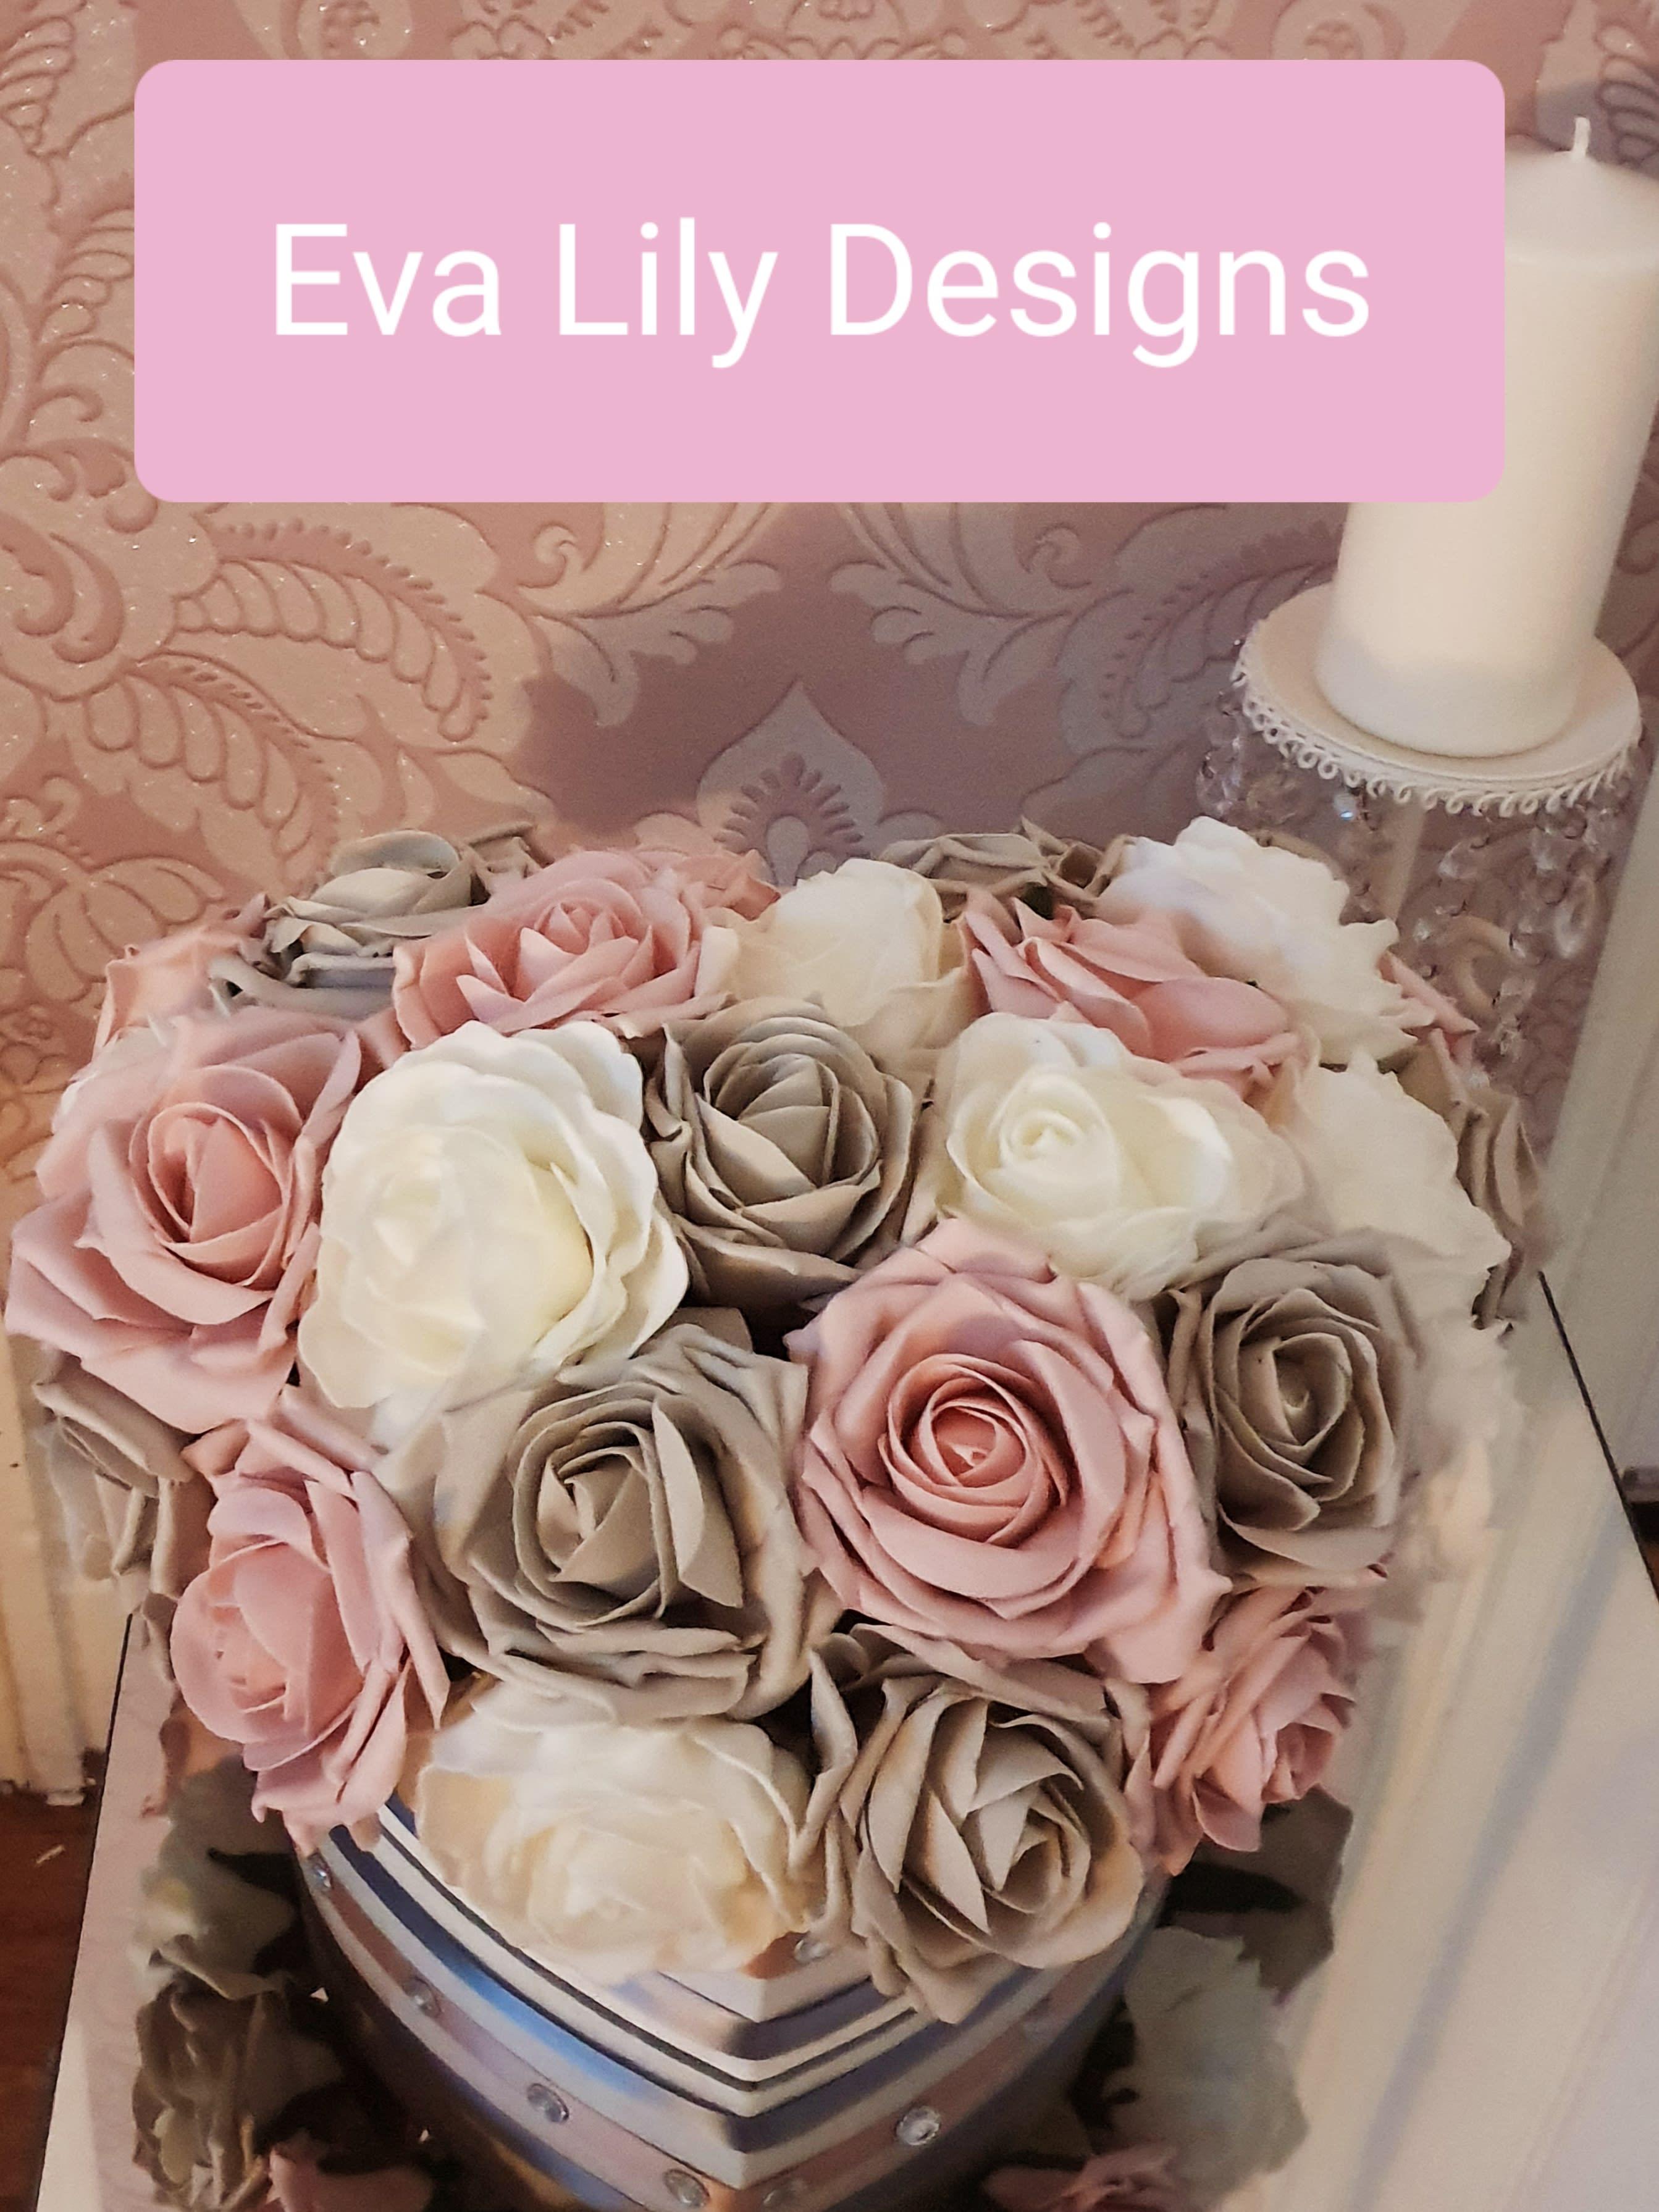 Eva Lily Designs